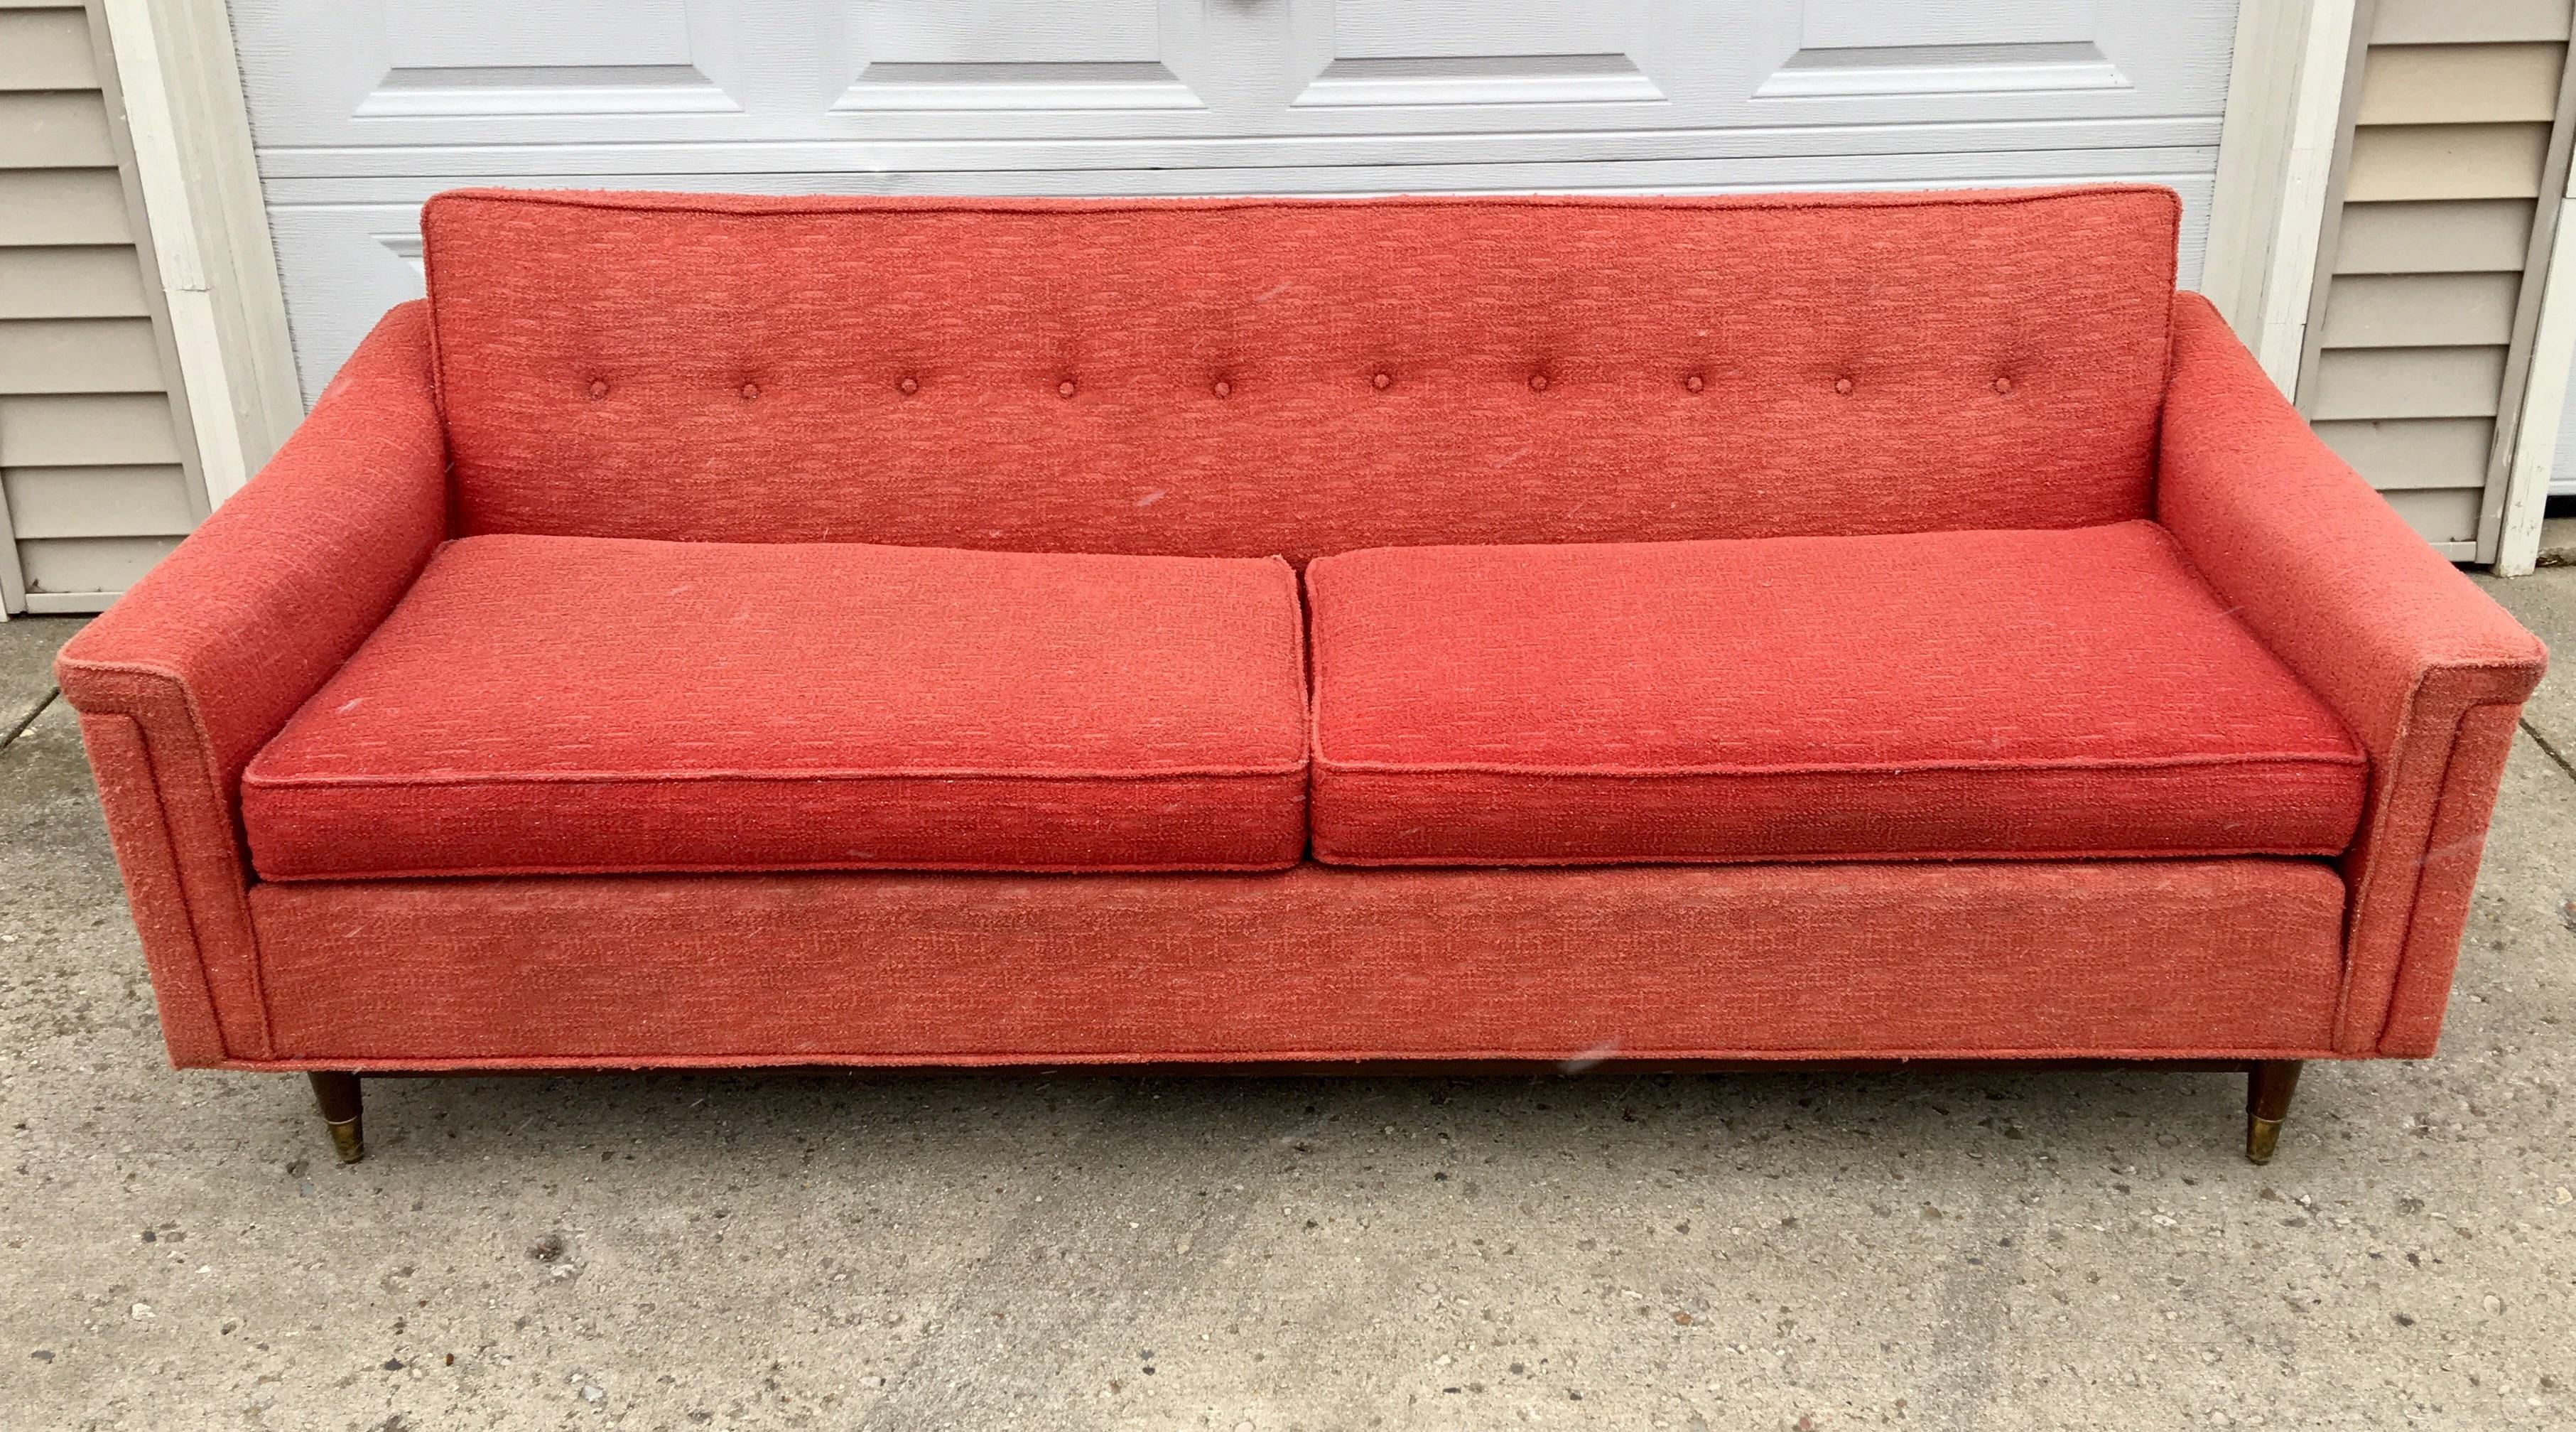 Colette Sofa Khaki Value City Furniture Kroehler Furniture Sofas